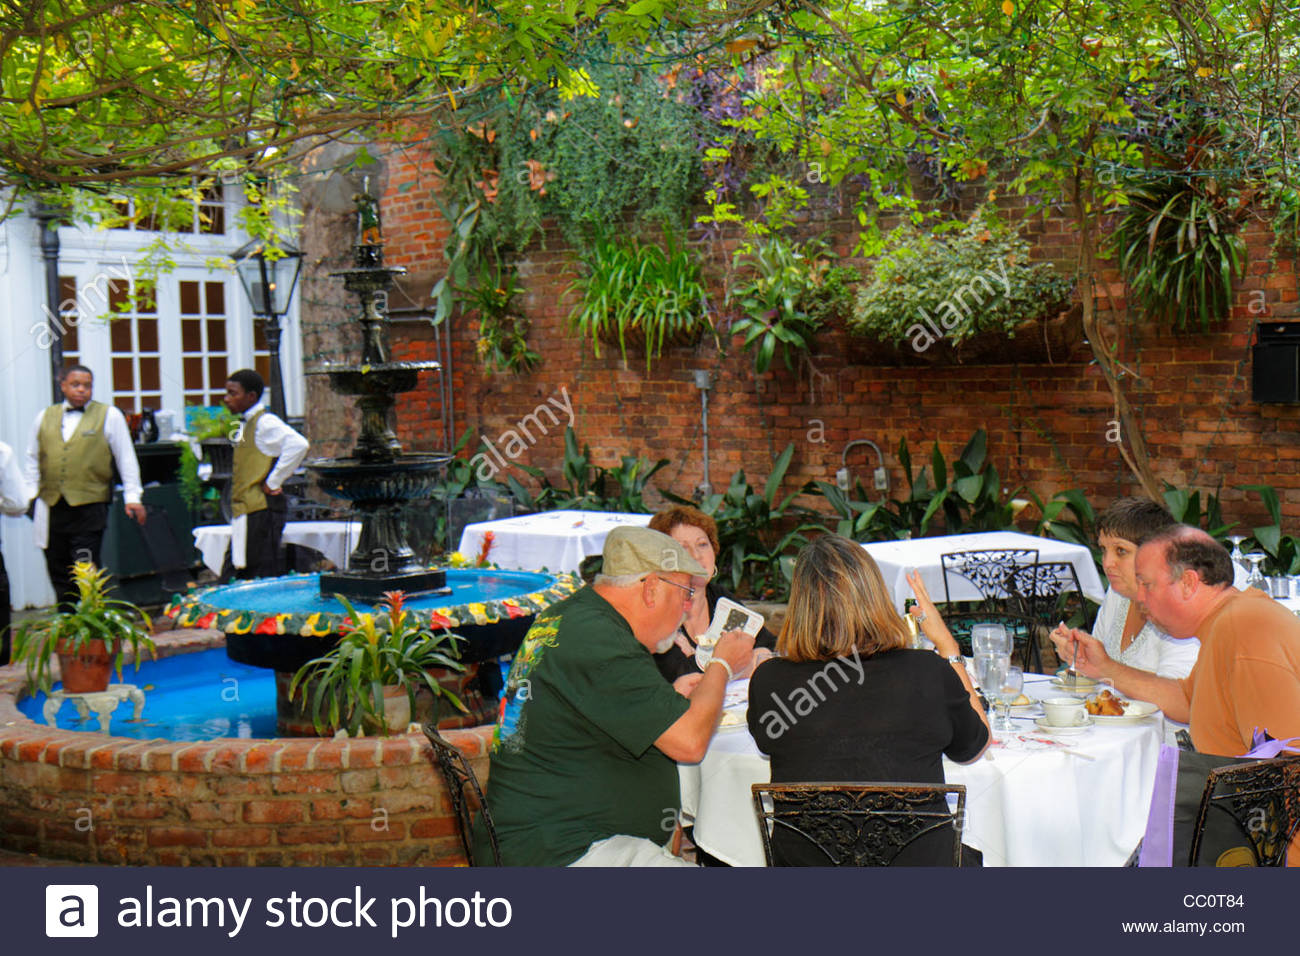 Tables On Street French Restaurant Stockfotos & Tables On Street ...